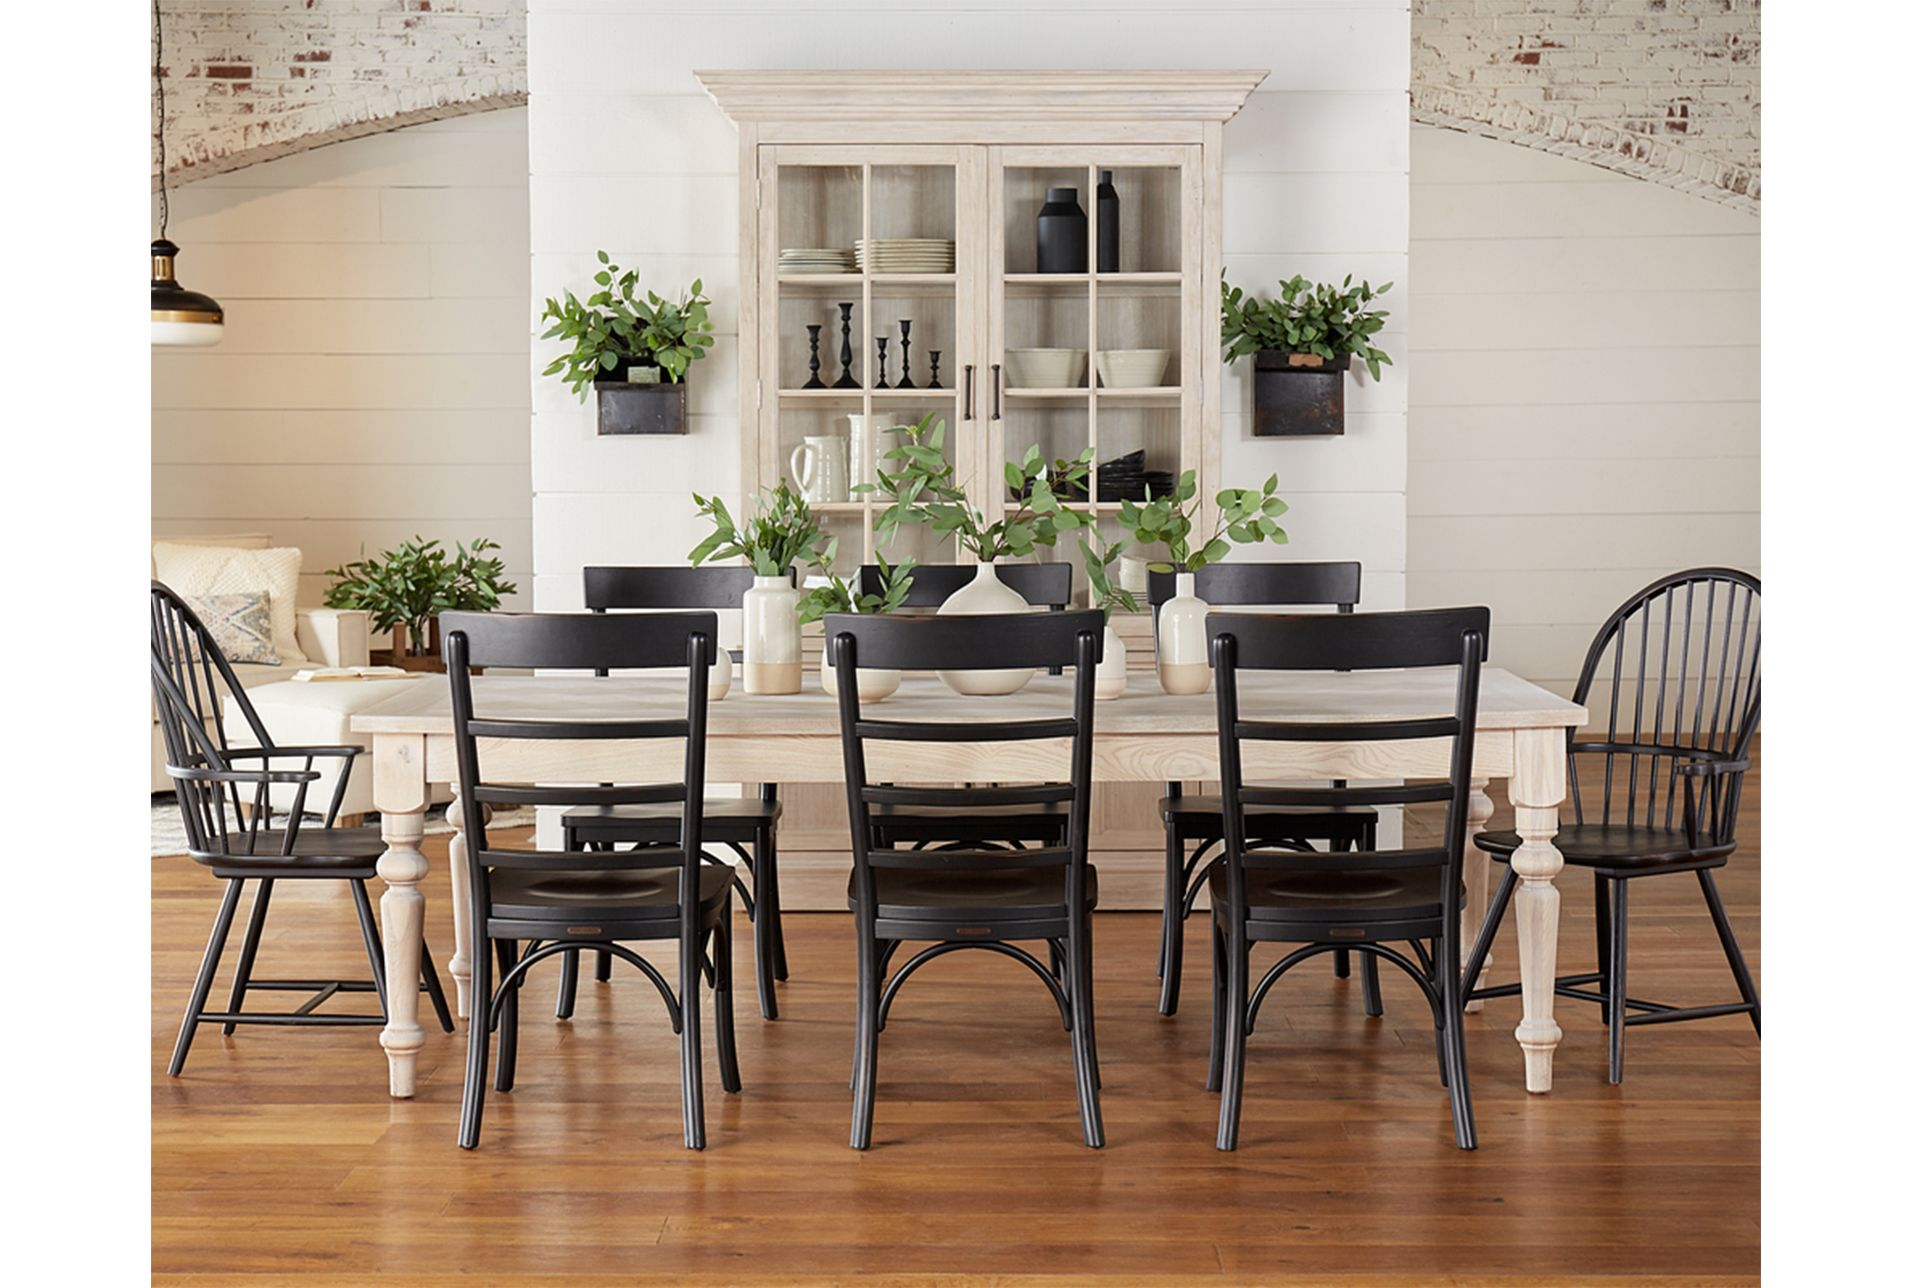 Joanna Gaines Dining Room Table Ideas - Home Design Ideas